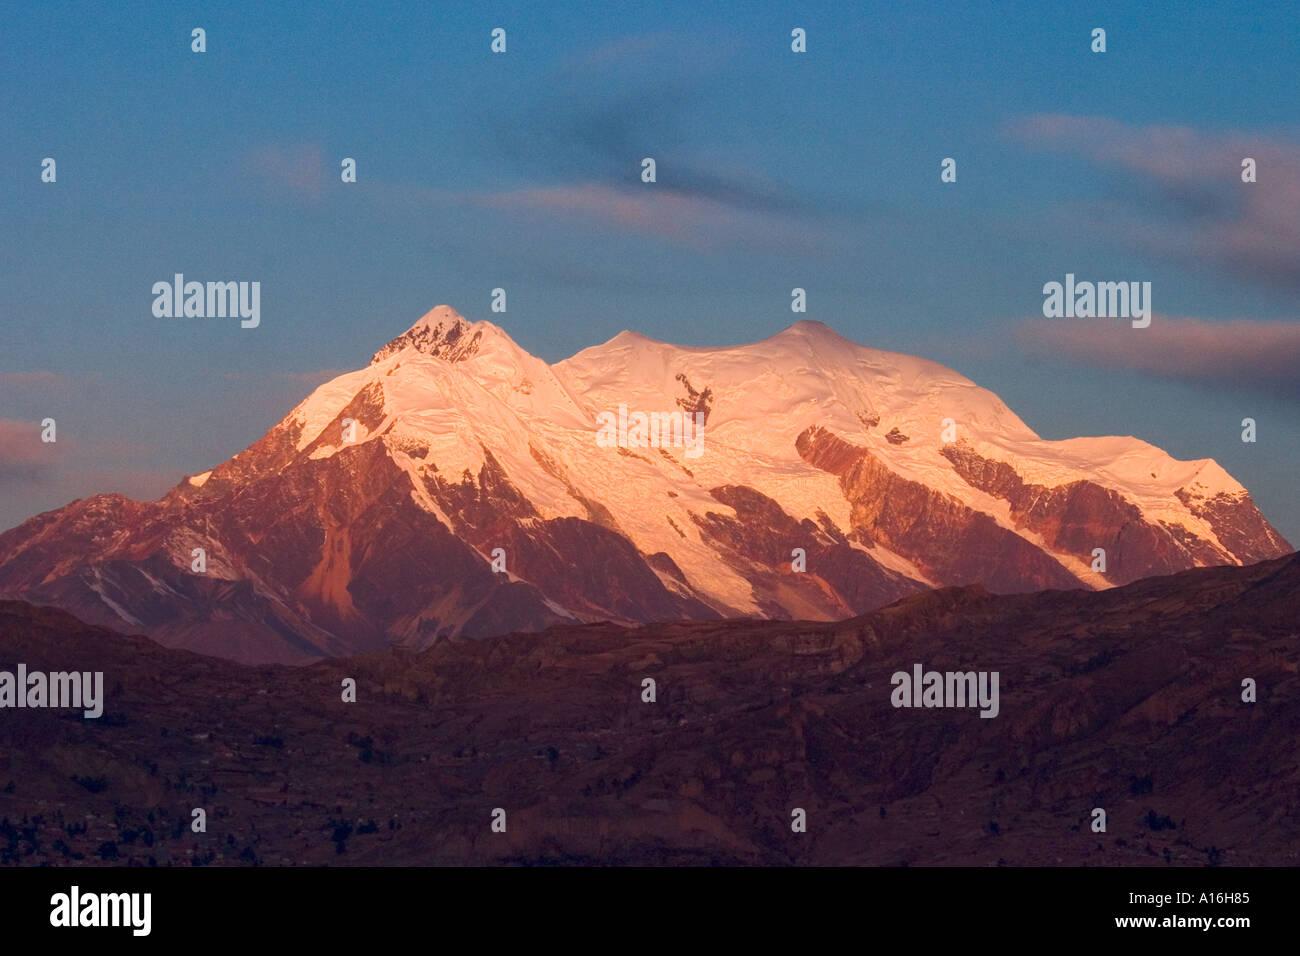 Mount Illimani 6460 mt at sunset La Paz Bolivia - Stock Image